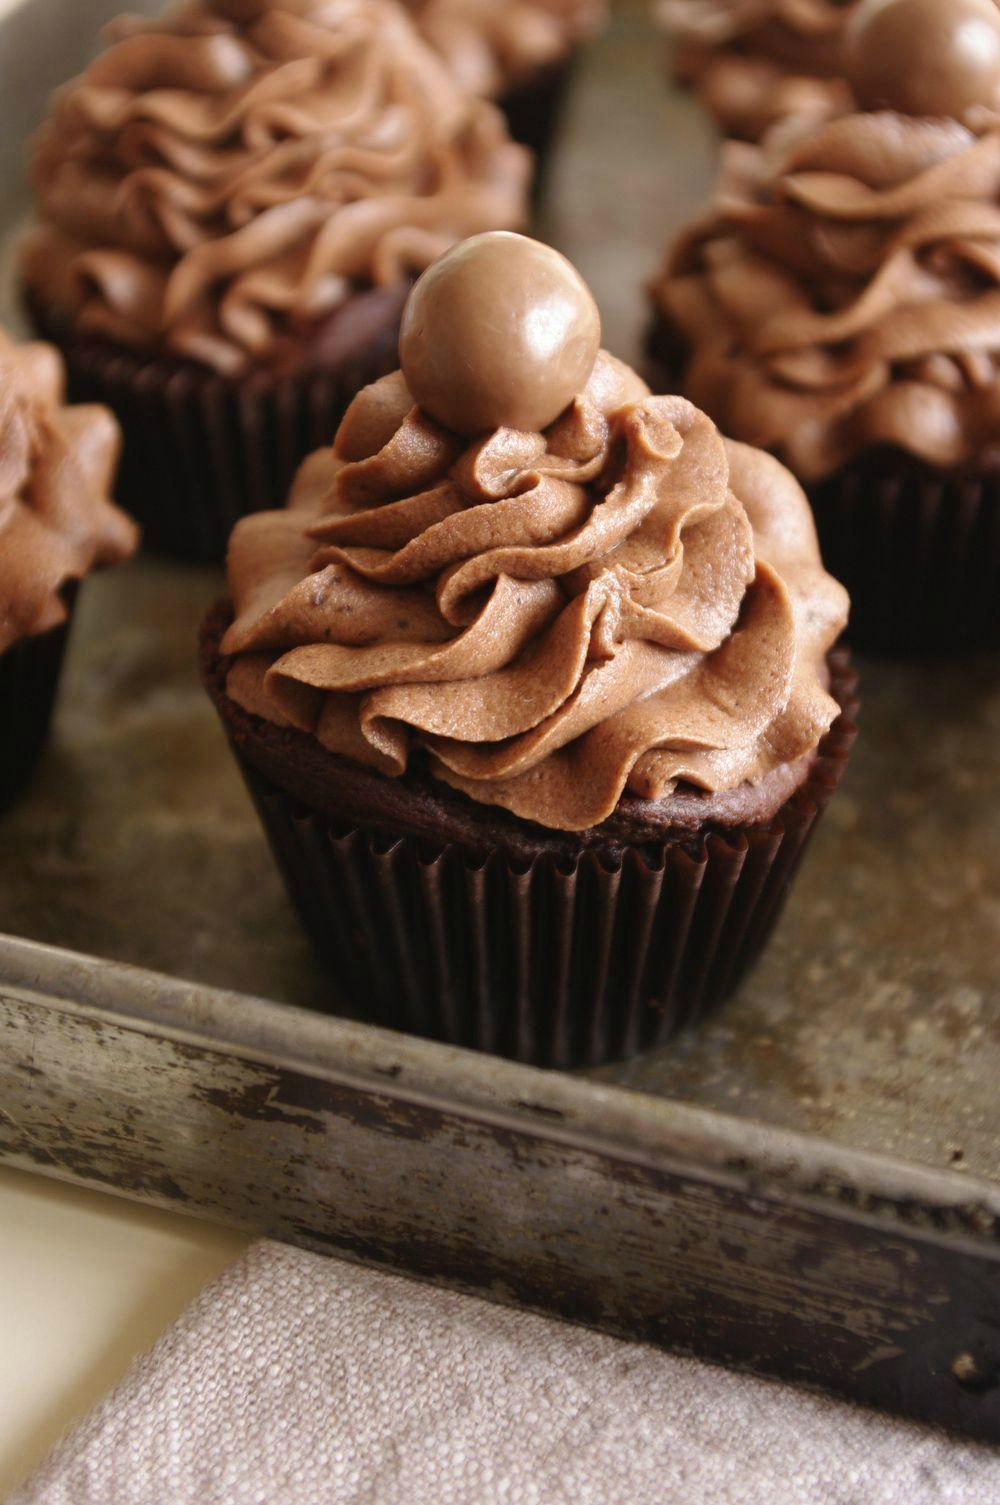 un cupcake au chocolat et ovomaltine un coeur en p te croustillante et un gla age ovomaltine. Black Bedroom Furniture Sets. Home Design Ideas